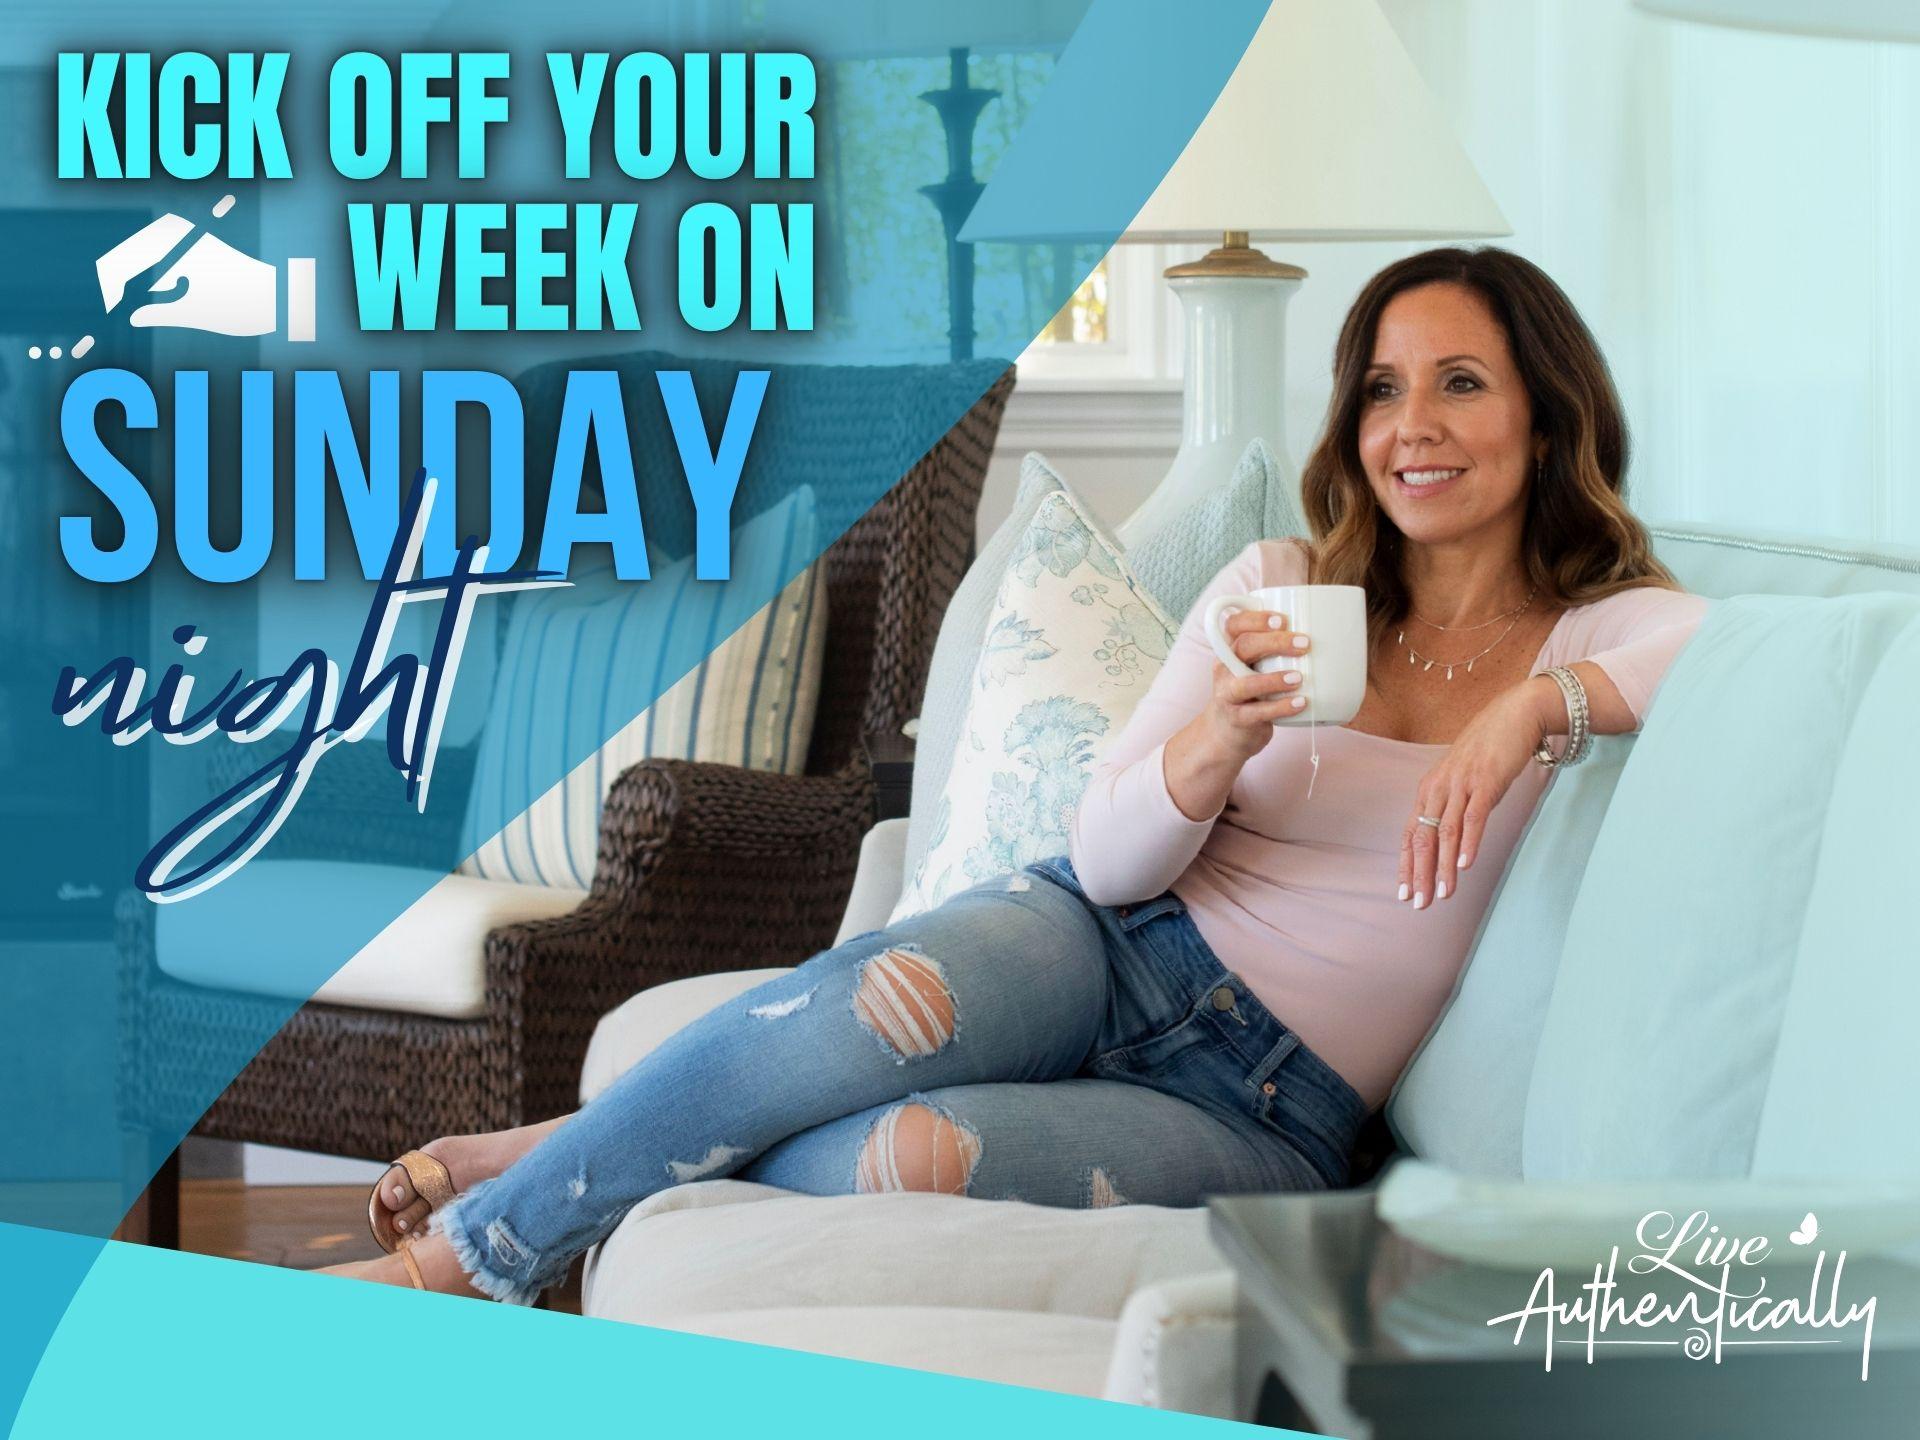 Kick off your week on Sunday night